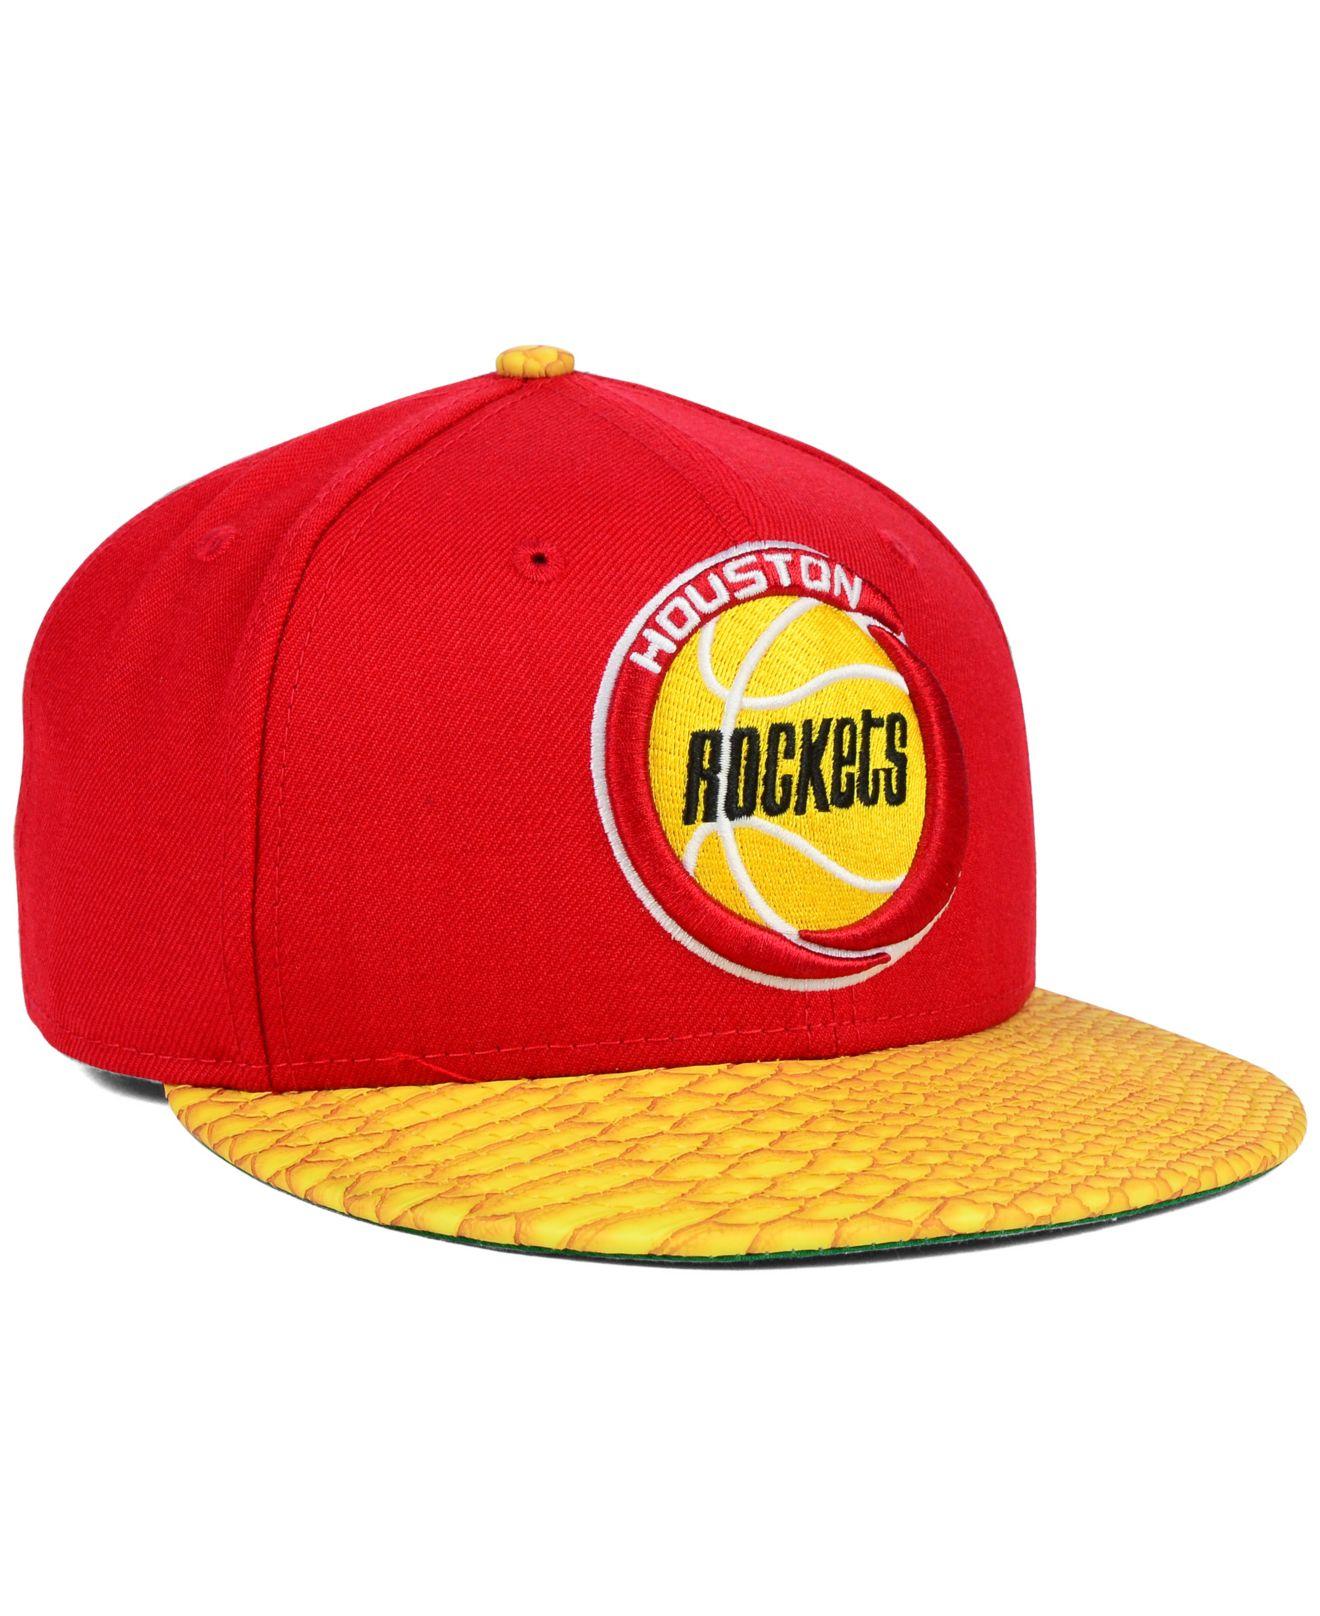 hot sale online 4802d bd3e1 ... promo code for new era 20676146 houston rockets nba hwc team color  59fifty black skyblue cap